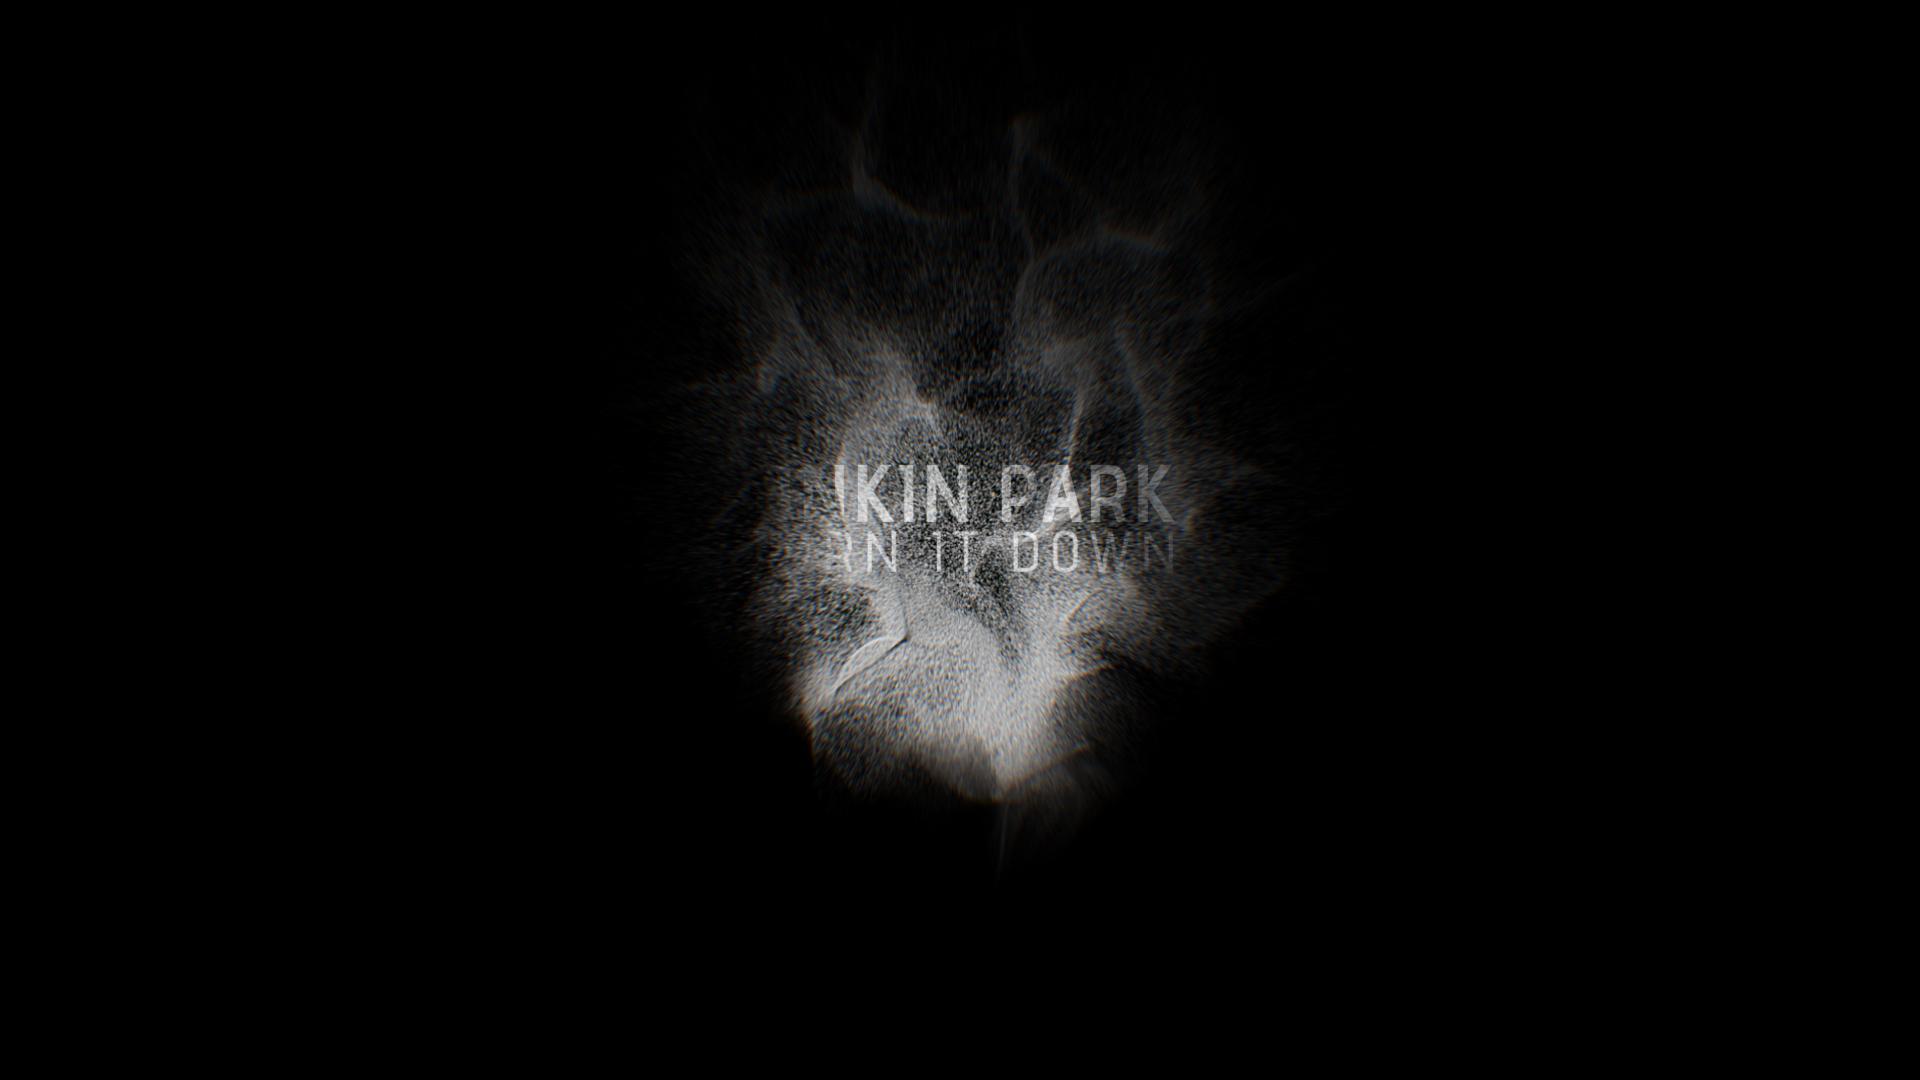 Simon Gipps Kent Top 10 Linkin Park Living Things Wallpaper 1920x1080